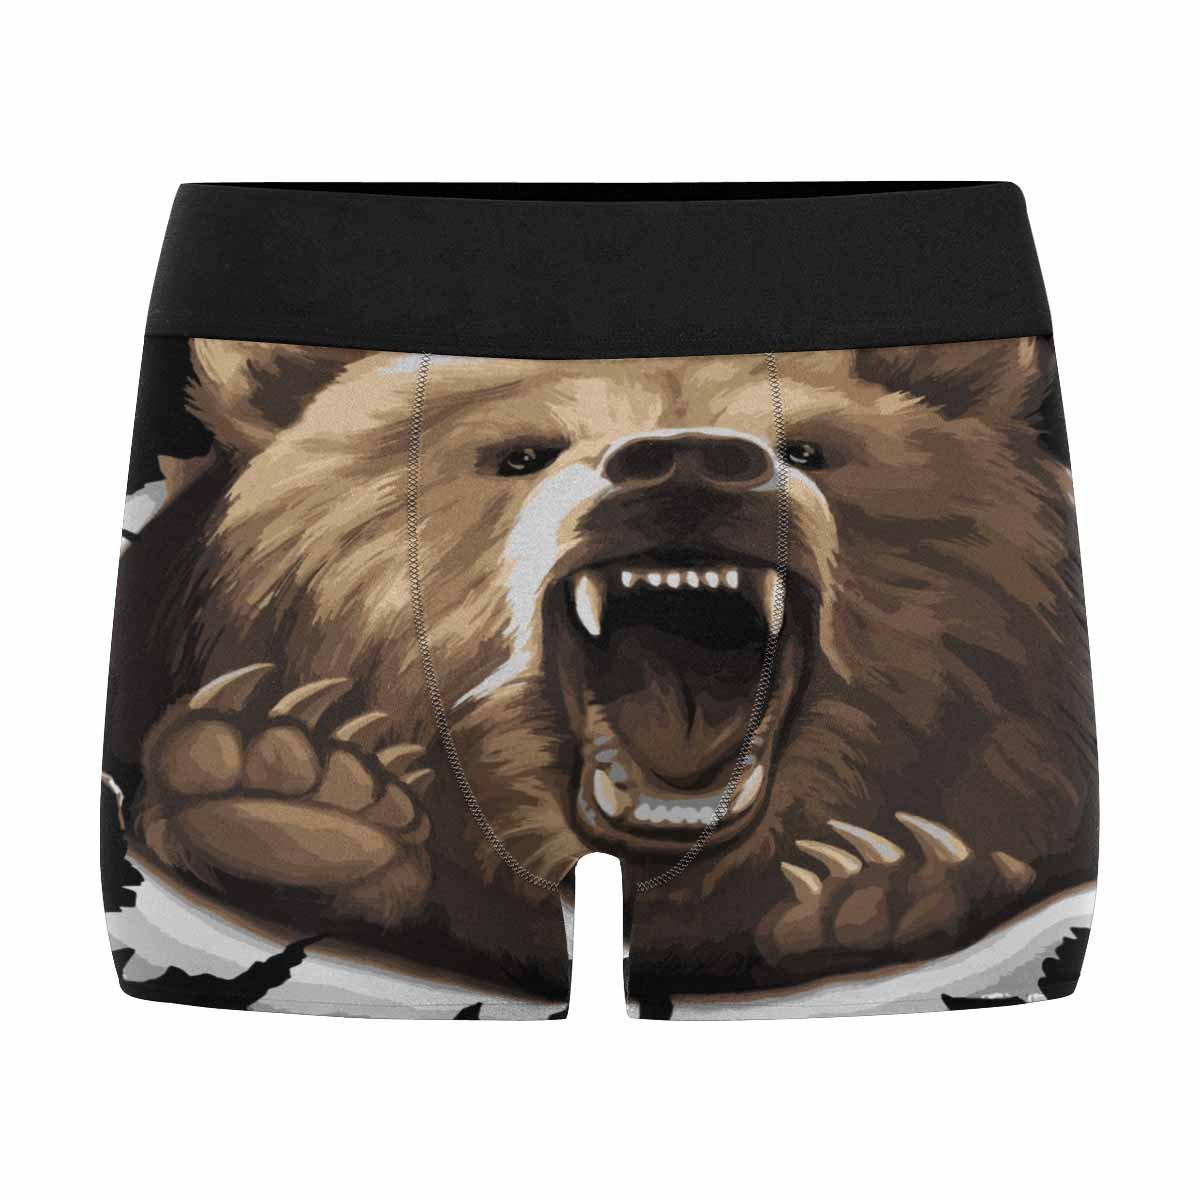 XS-3XL INTERESTPRINT Boxer Briefs Mens Underwear Angry Bear Roaring